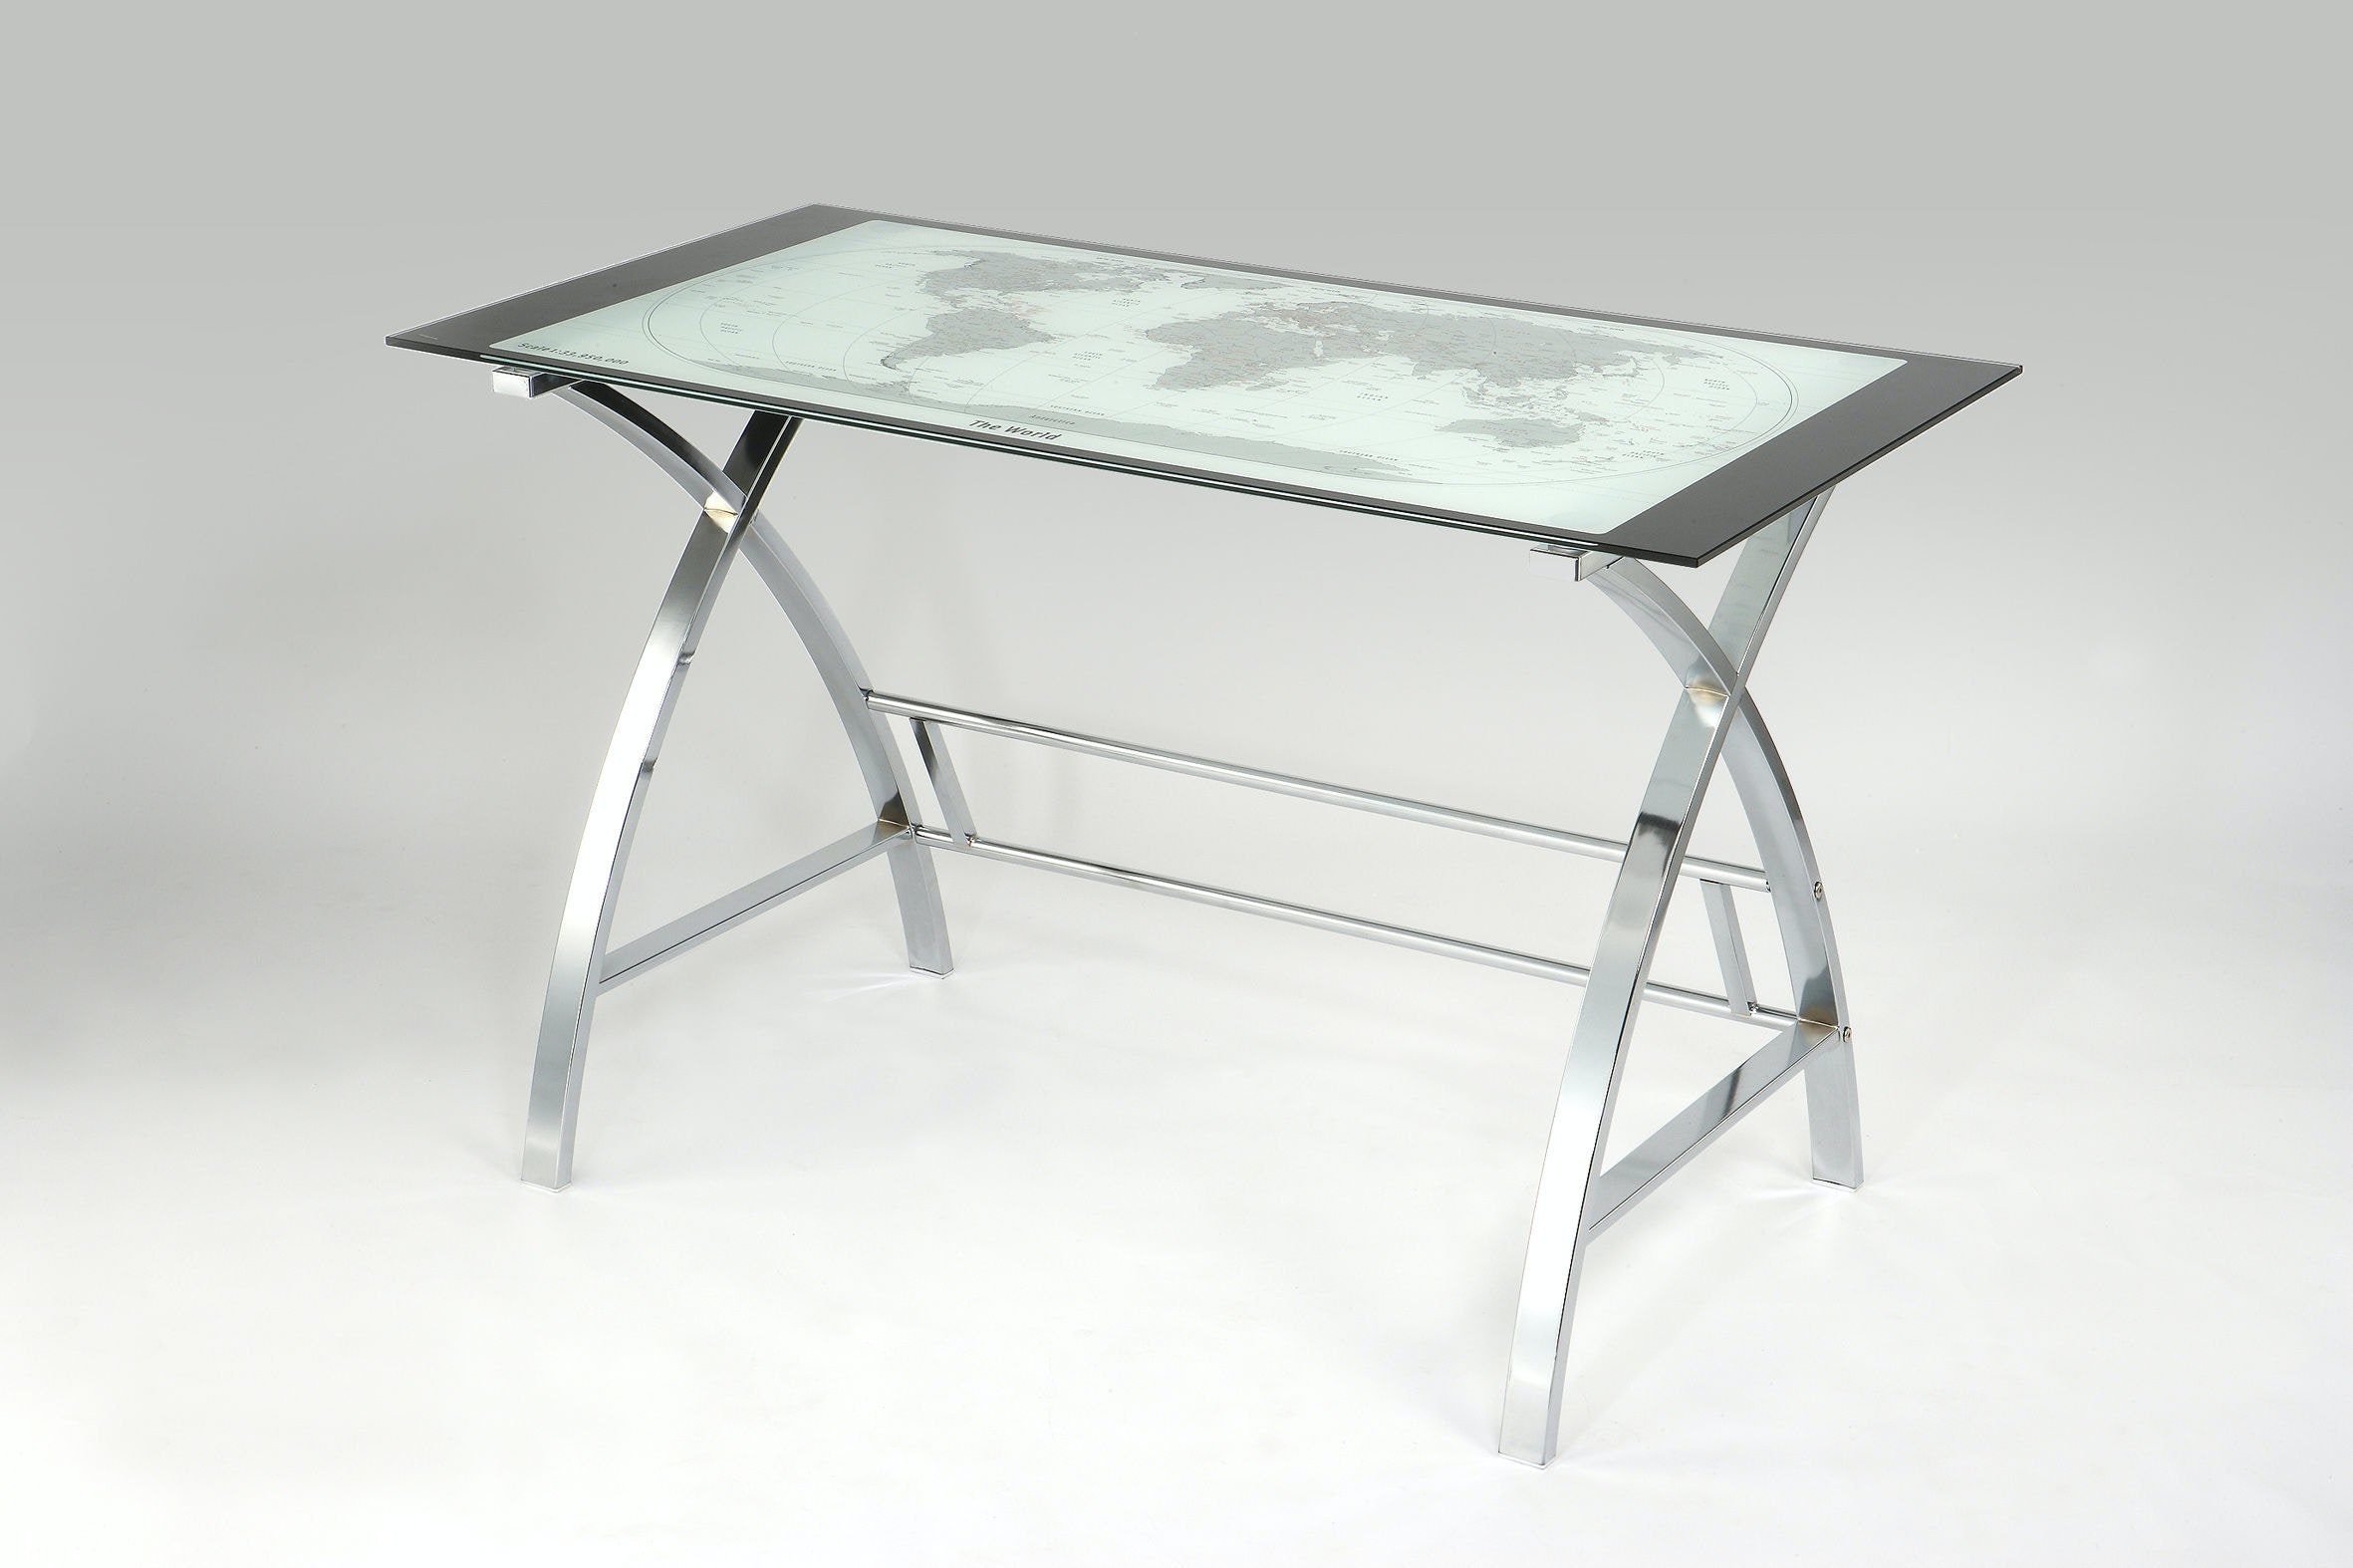 office world desks. Powell Furniture World Map Printing Curved X-Sided Computer Desk 942-240 Office Desks